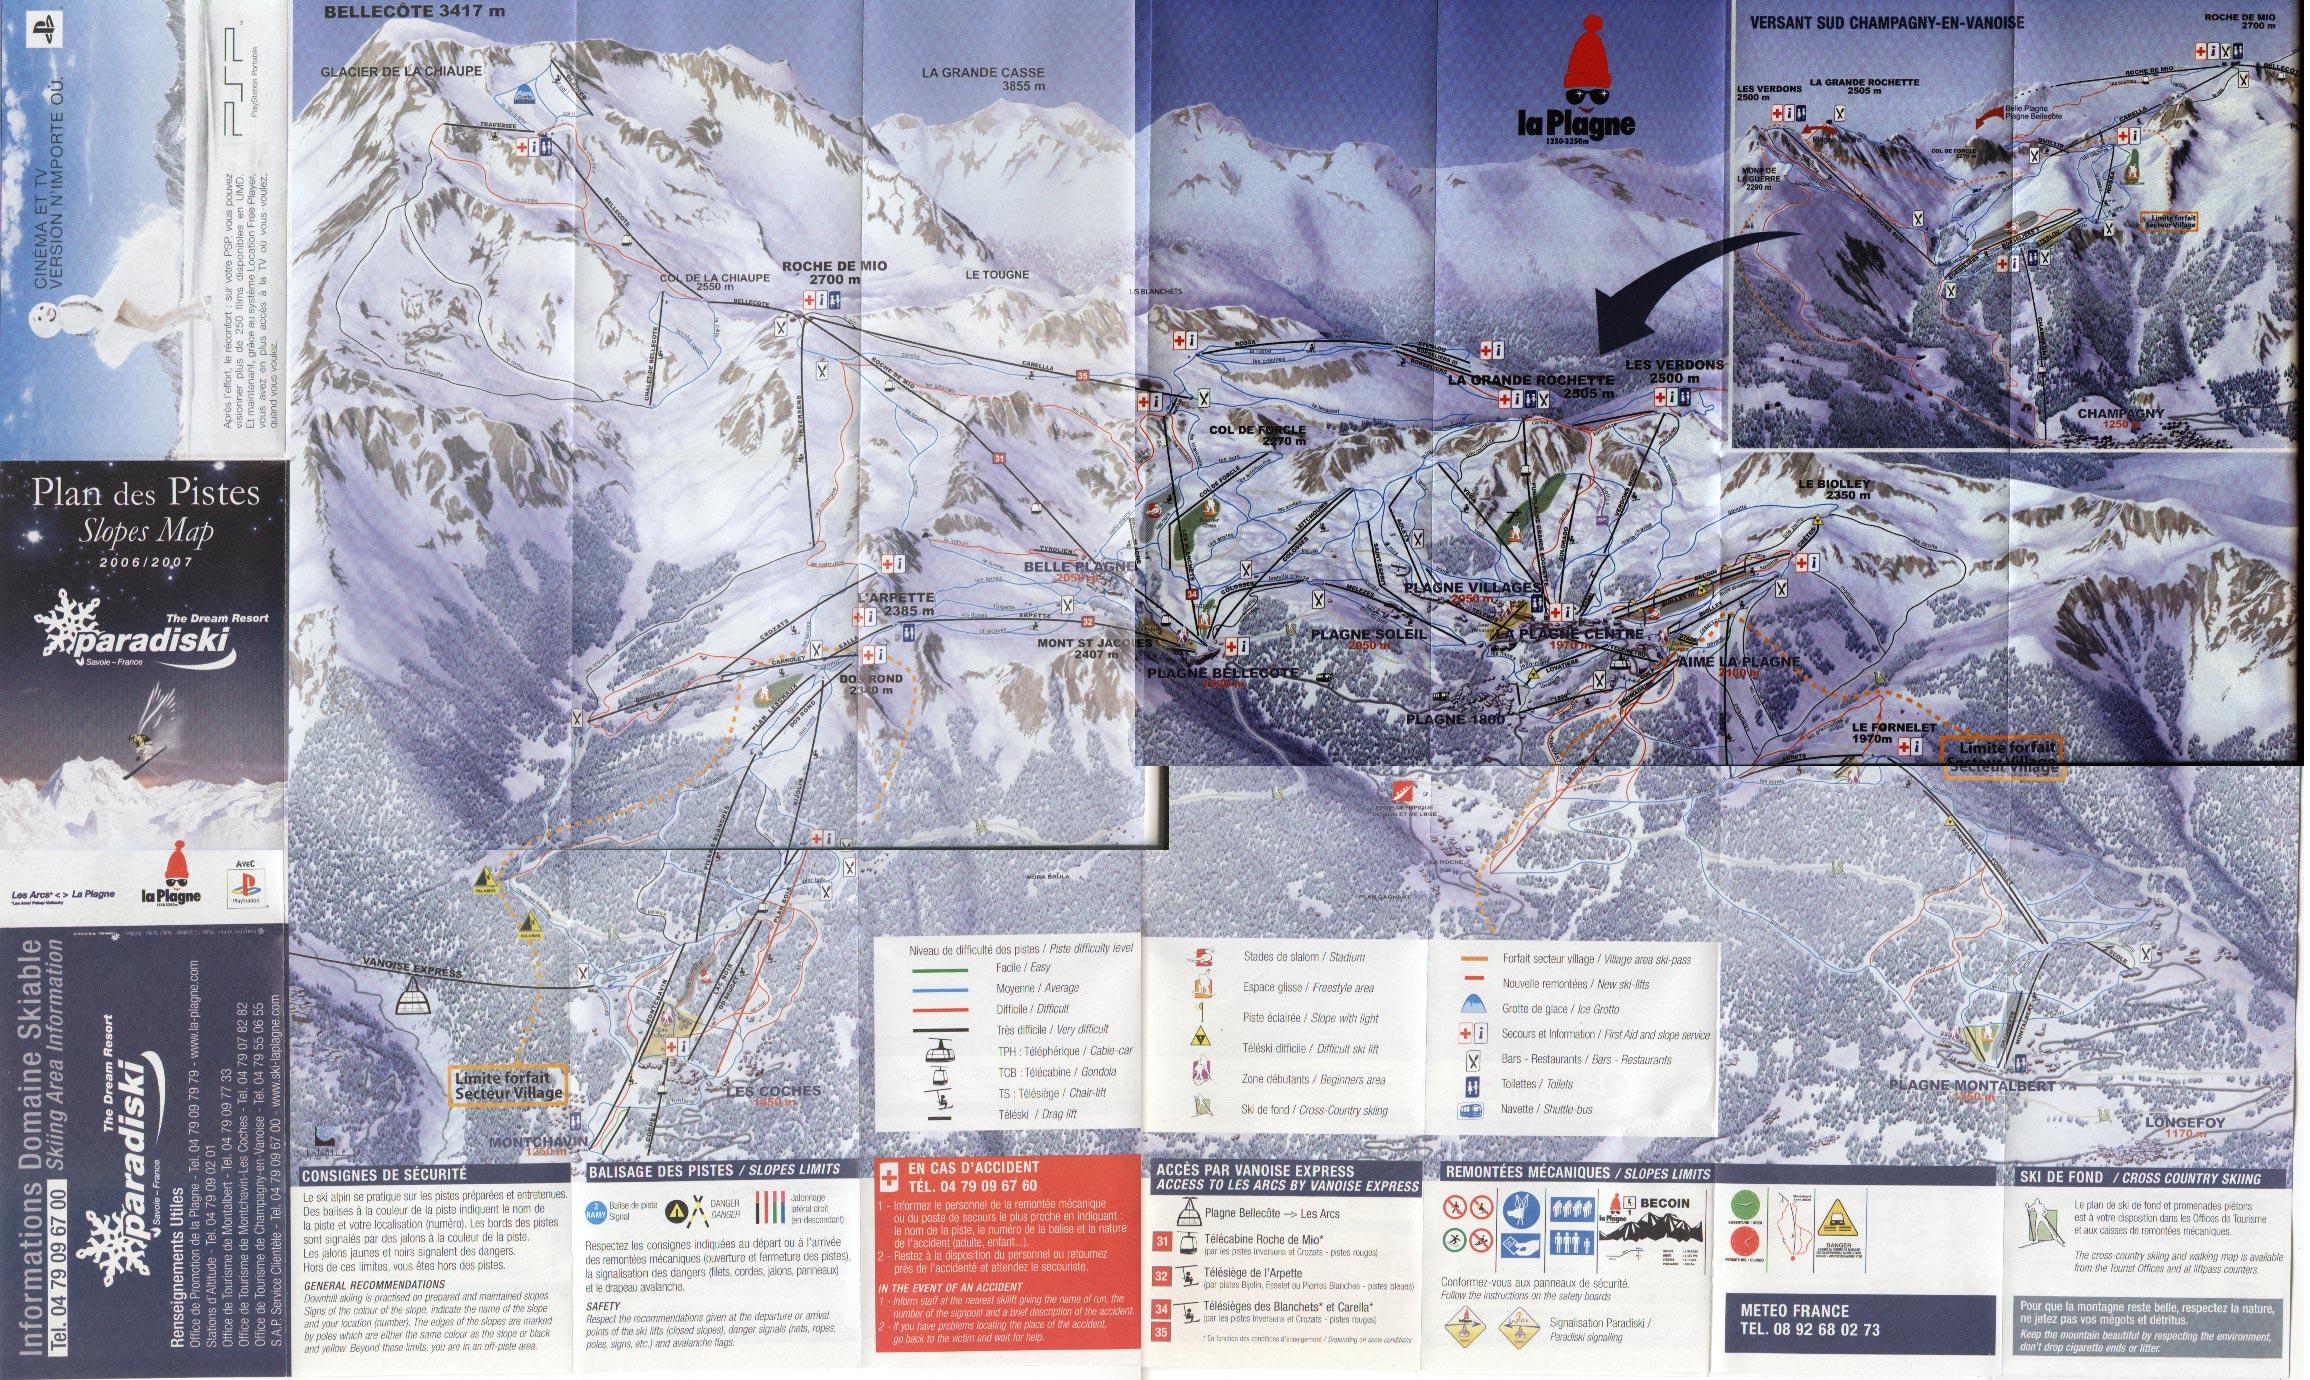 La Plagne Piste Map and Mini Review